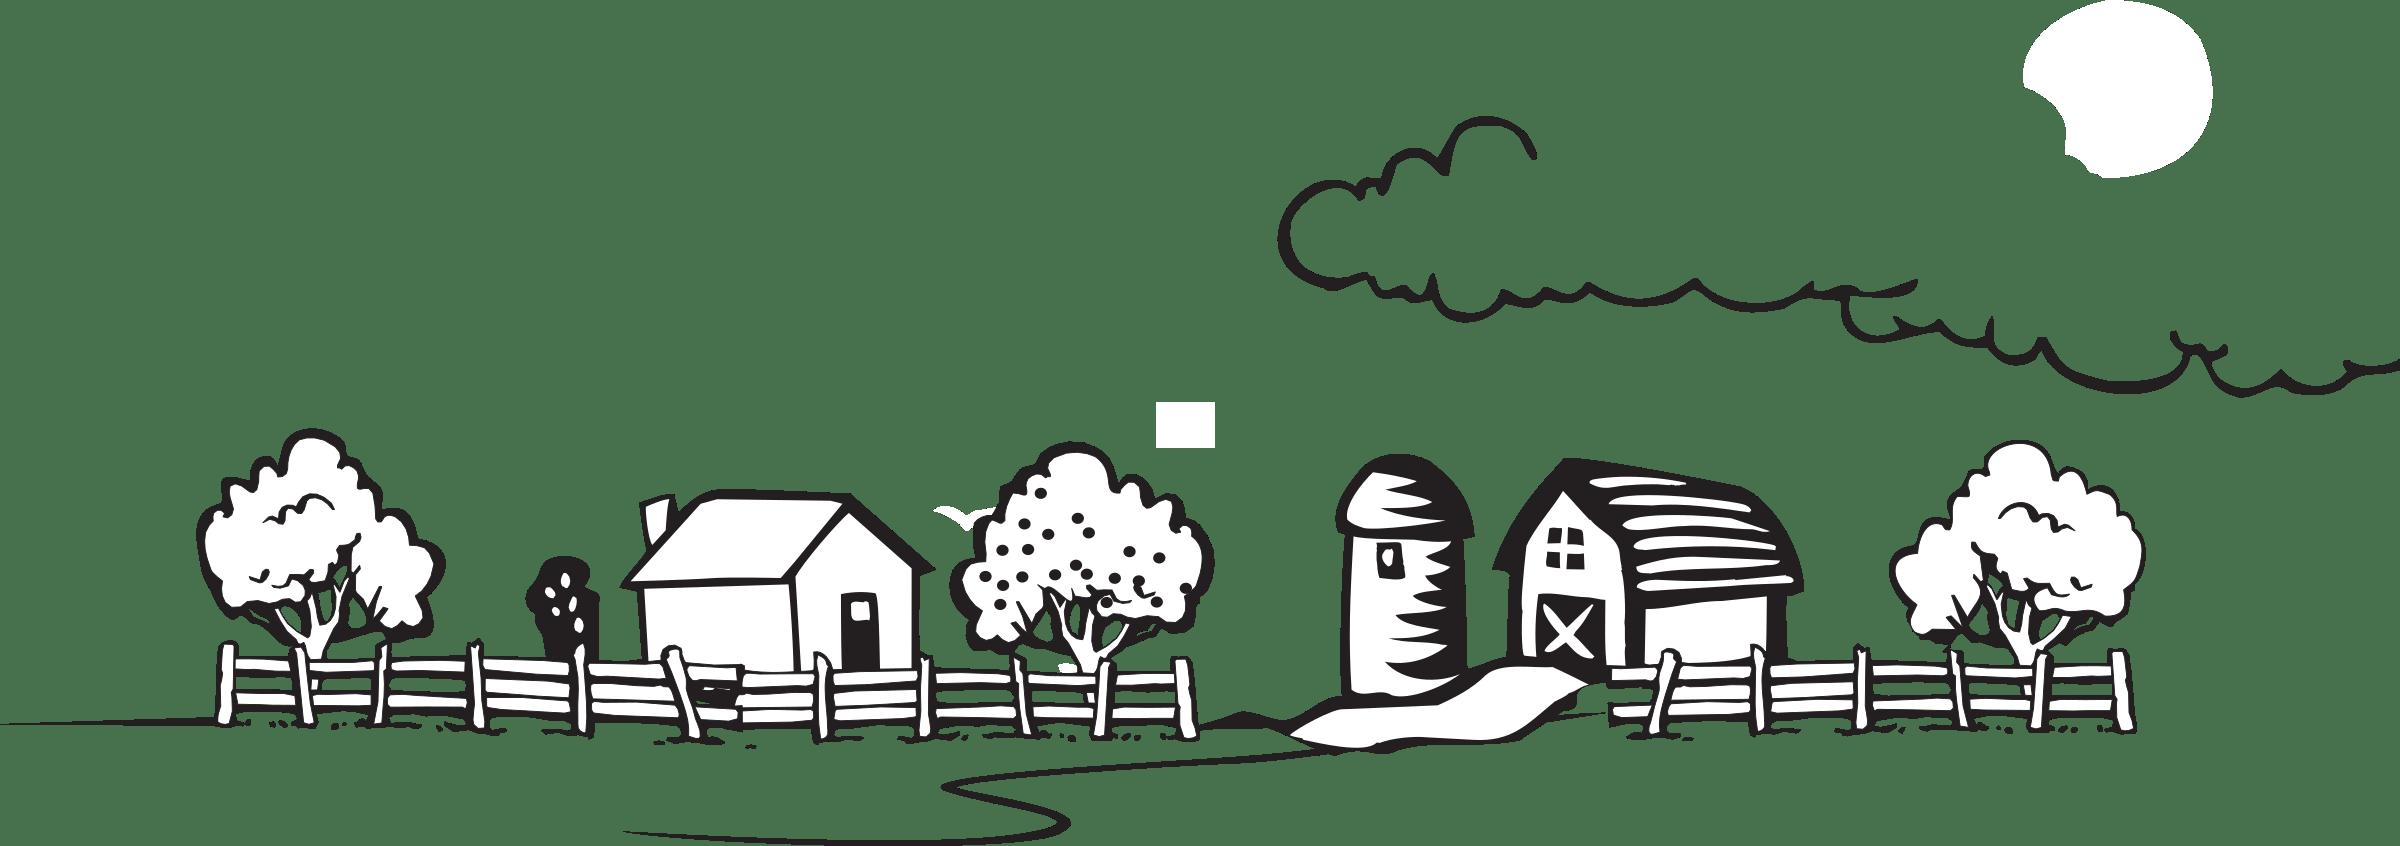 Farm House Cblack And White Clipart 20 Free Cliparts